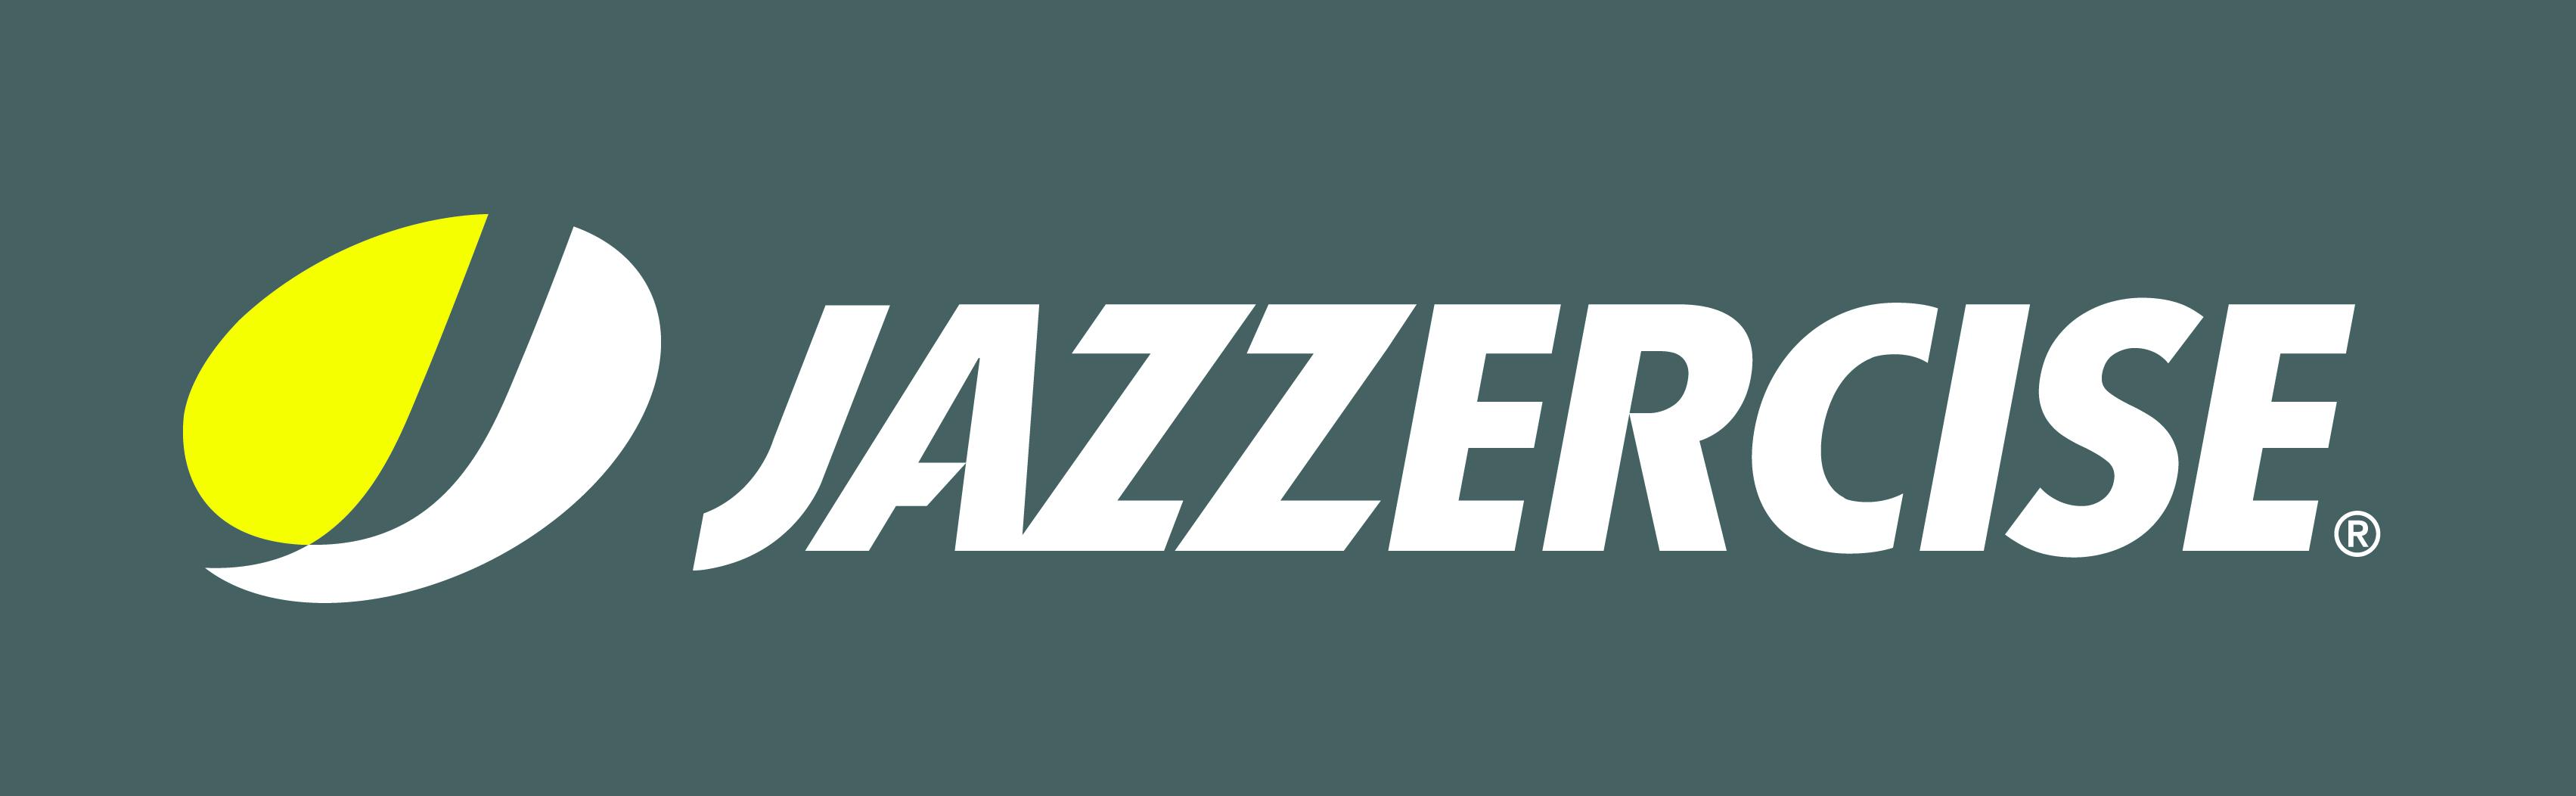 jazzercise logos